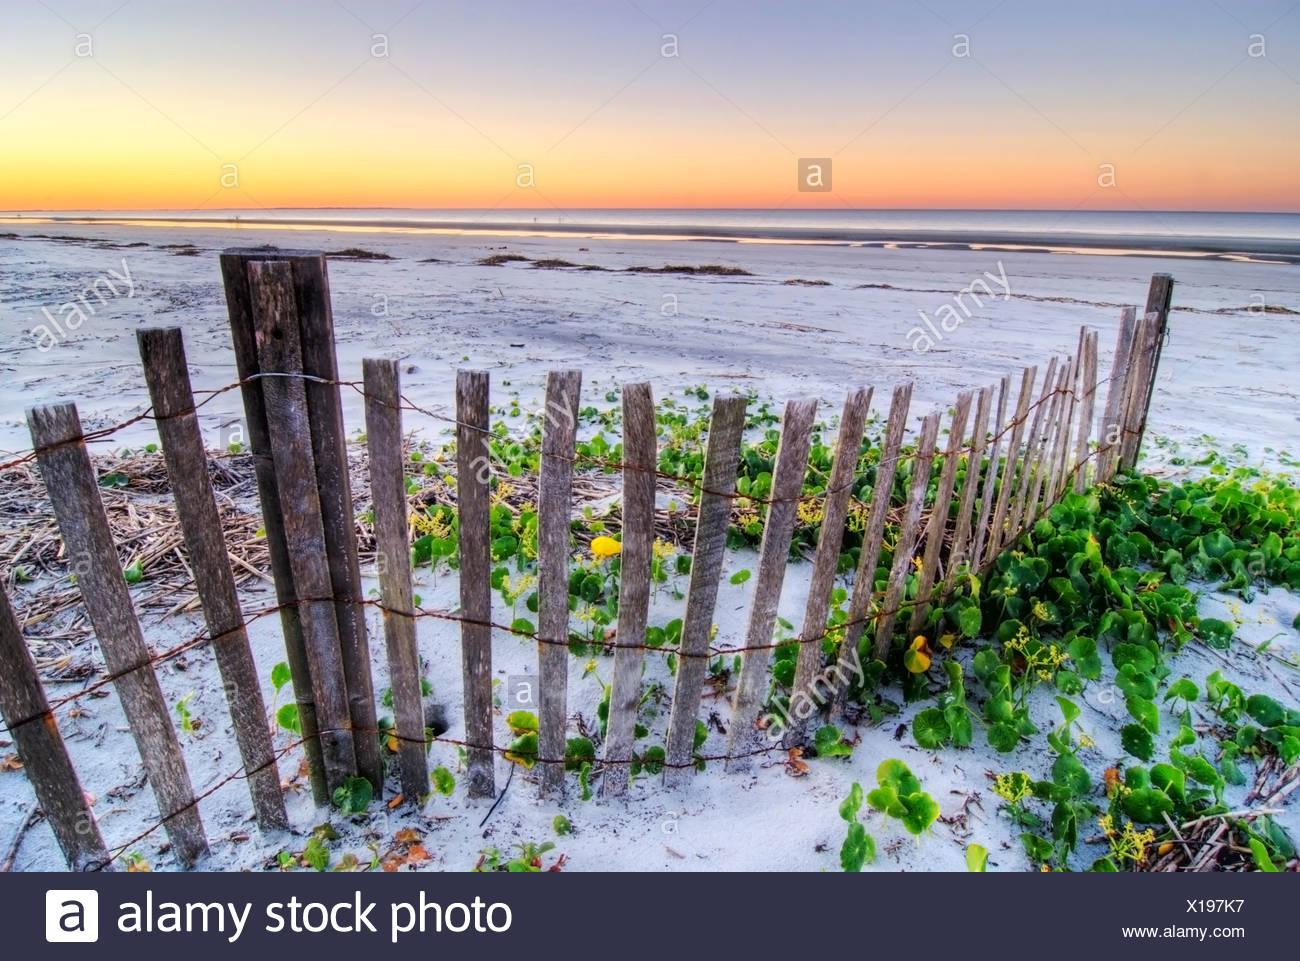 A beach fence at sunset on Hilton Head Island, South Carolina. - Stock Image